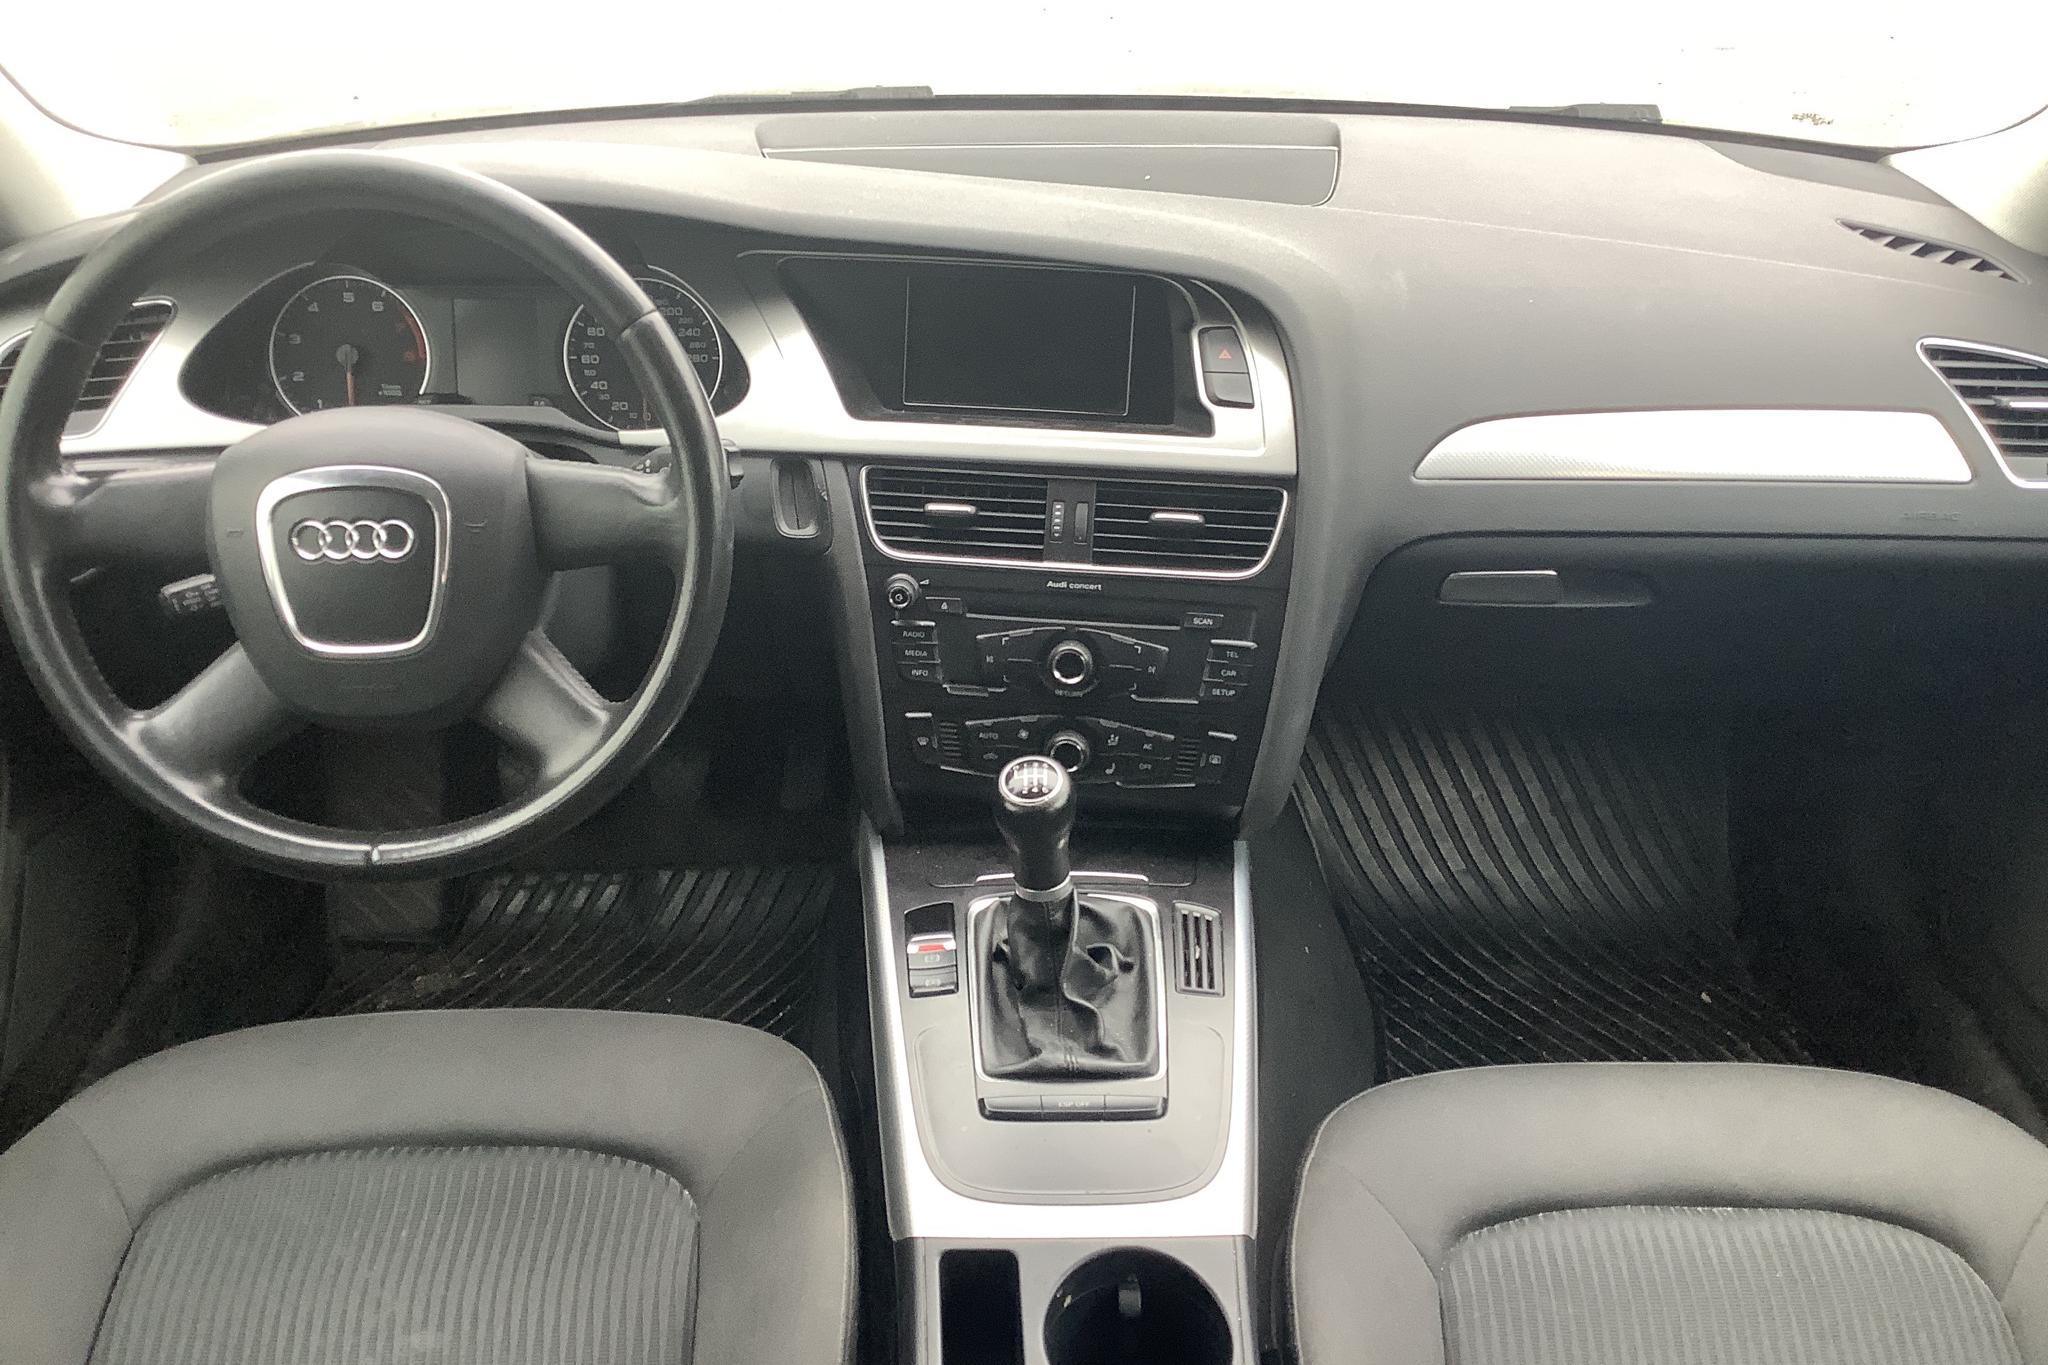 Audi A4 1.8 TFSI Avant (160hk) - 18 043 mil - Manuell - Light Brown - 2009